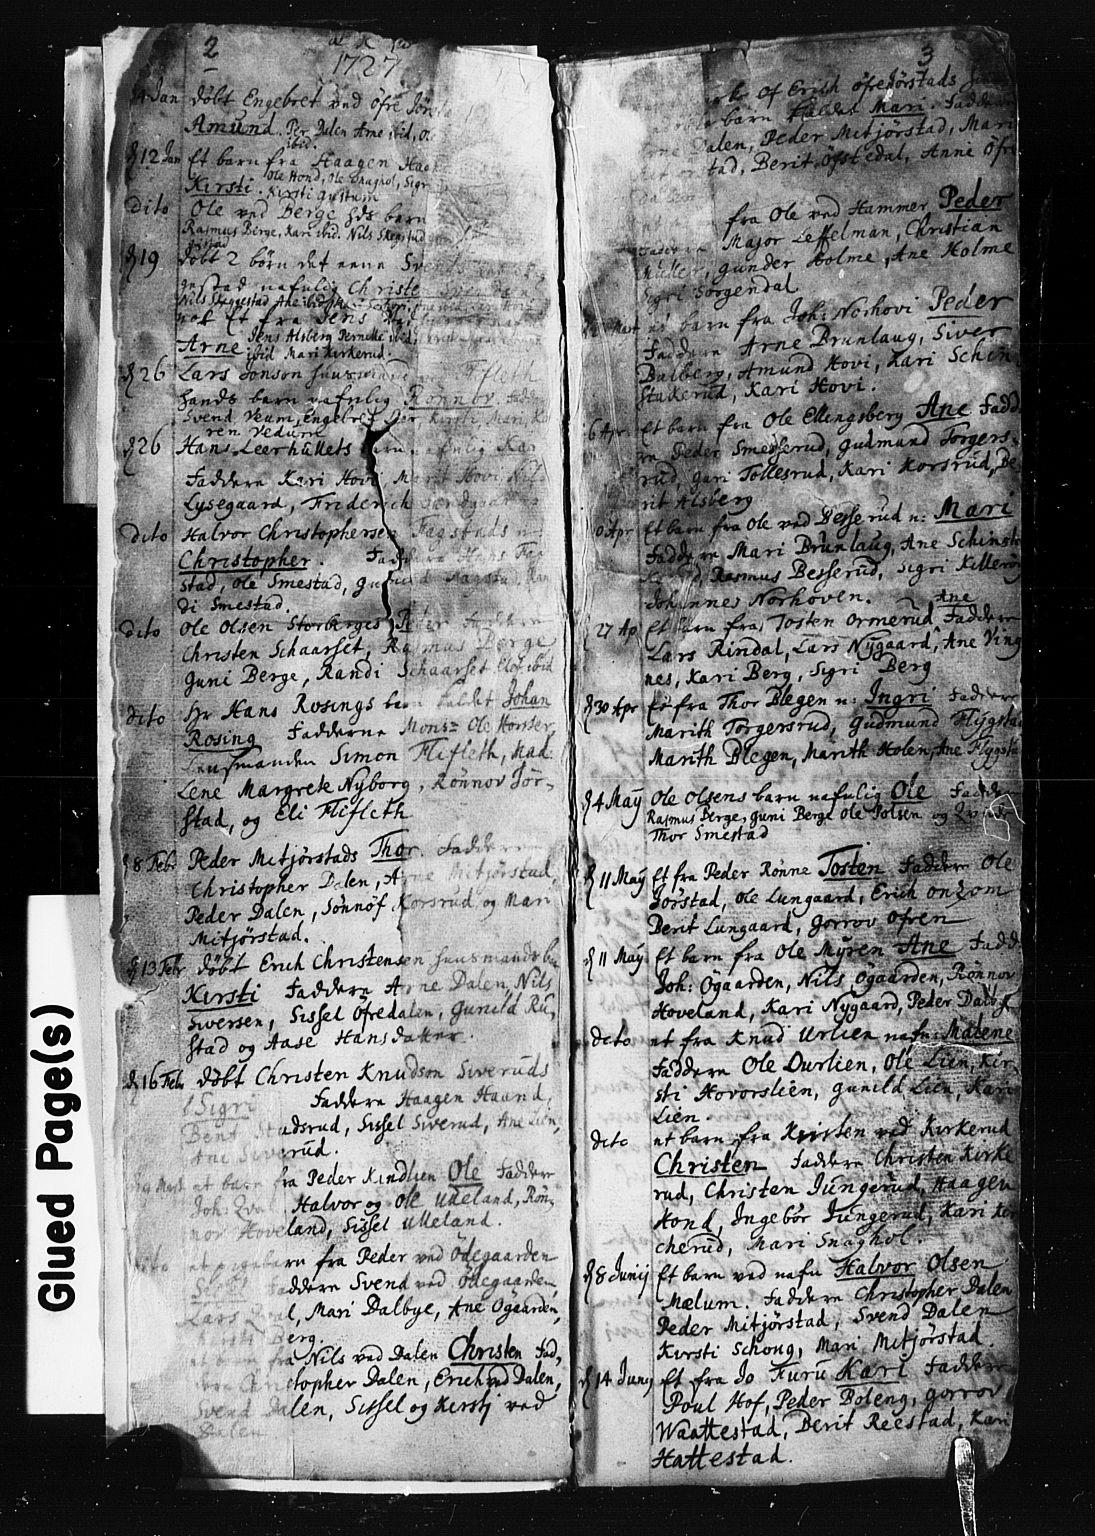 SAH, Fåberg prestekontor, Klokkerbok nr. 1, 1727-1767, s. 2-3